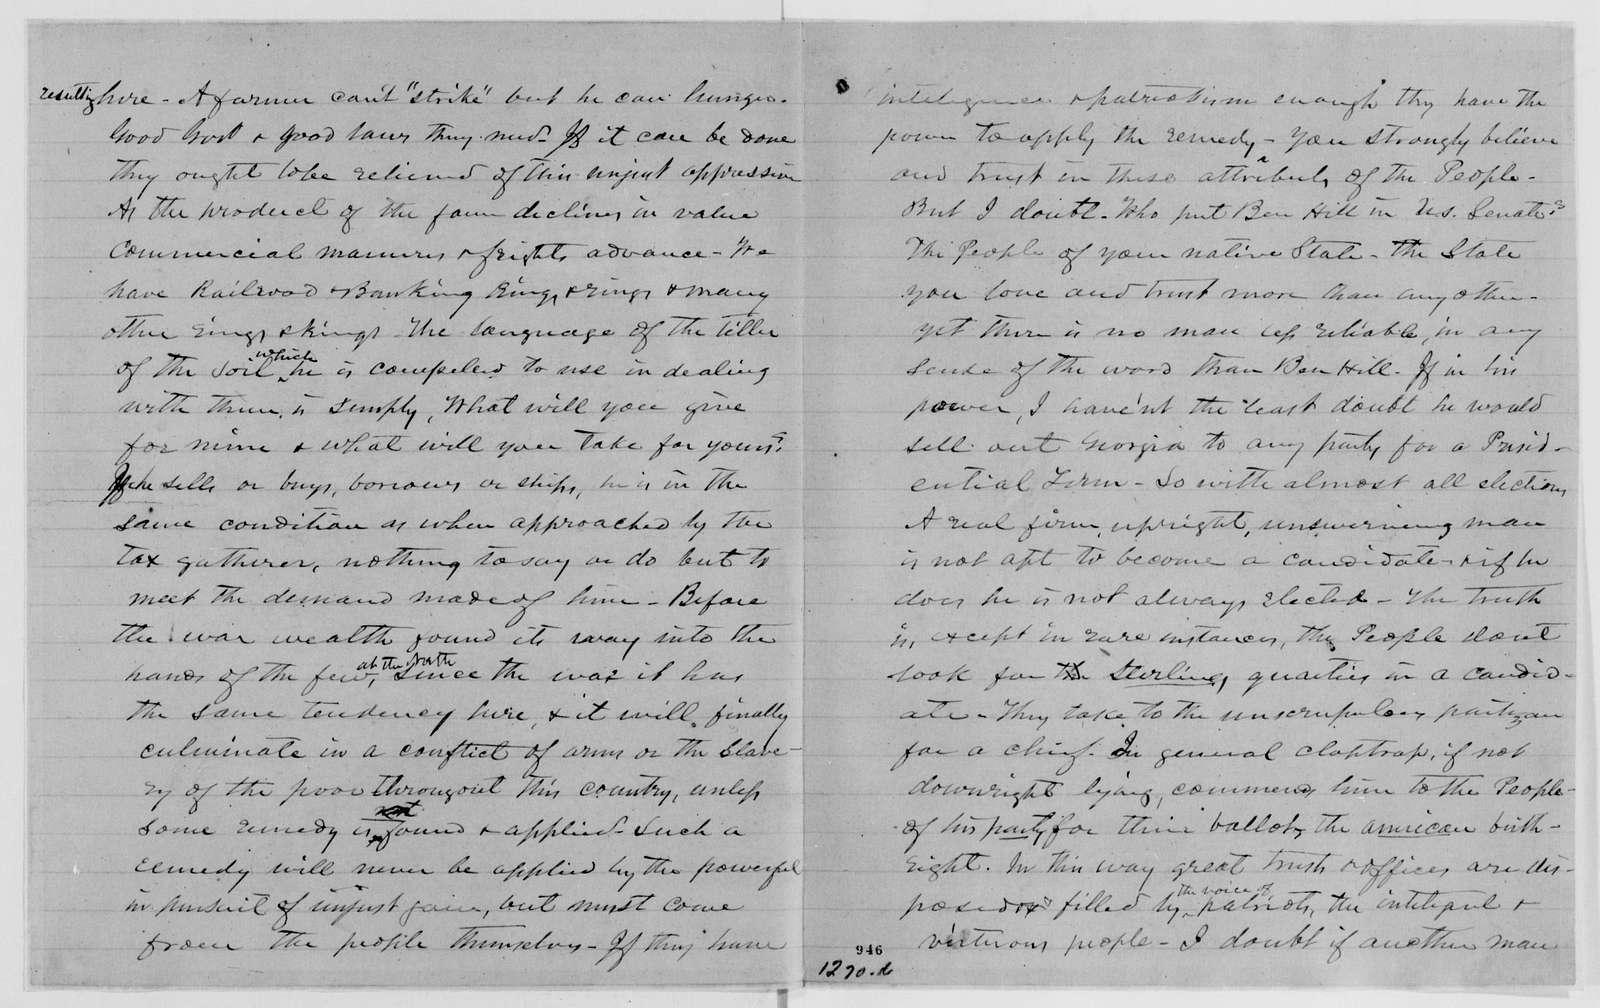 Alexander Hamilton Stephens Papers: General Correspondence, 1784-1886; 1882, Oct. 9-1883, Jan. 5